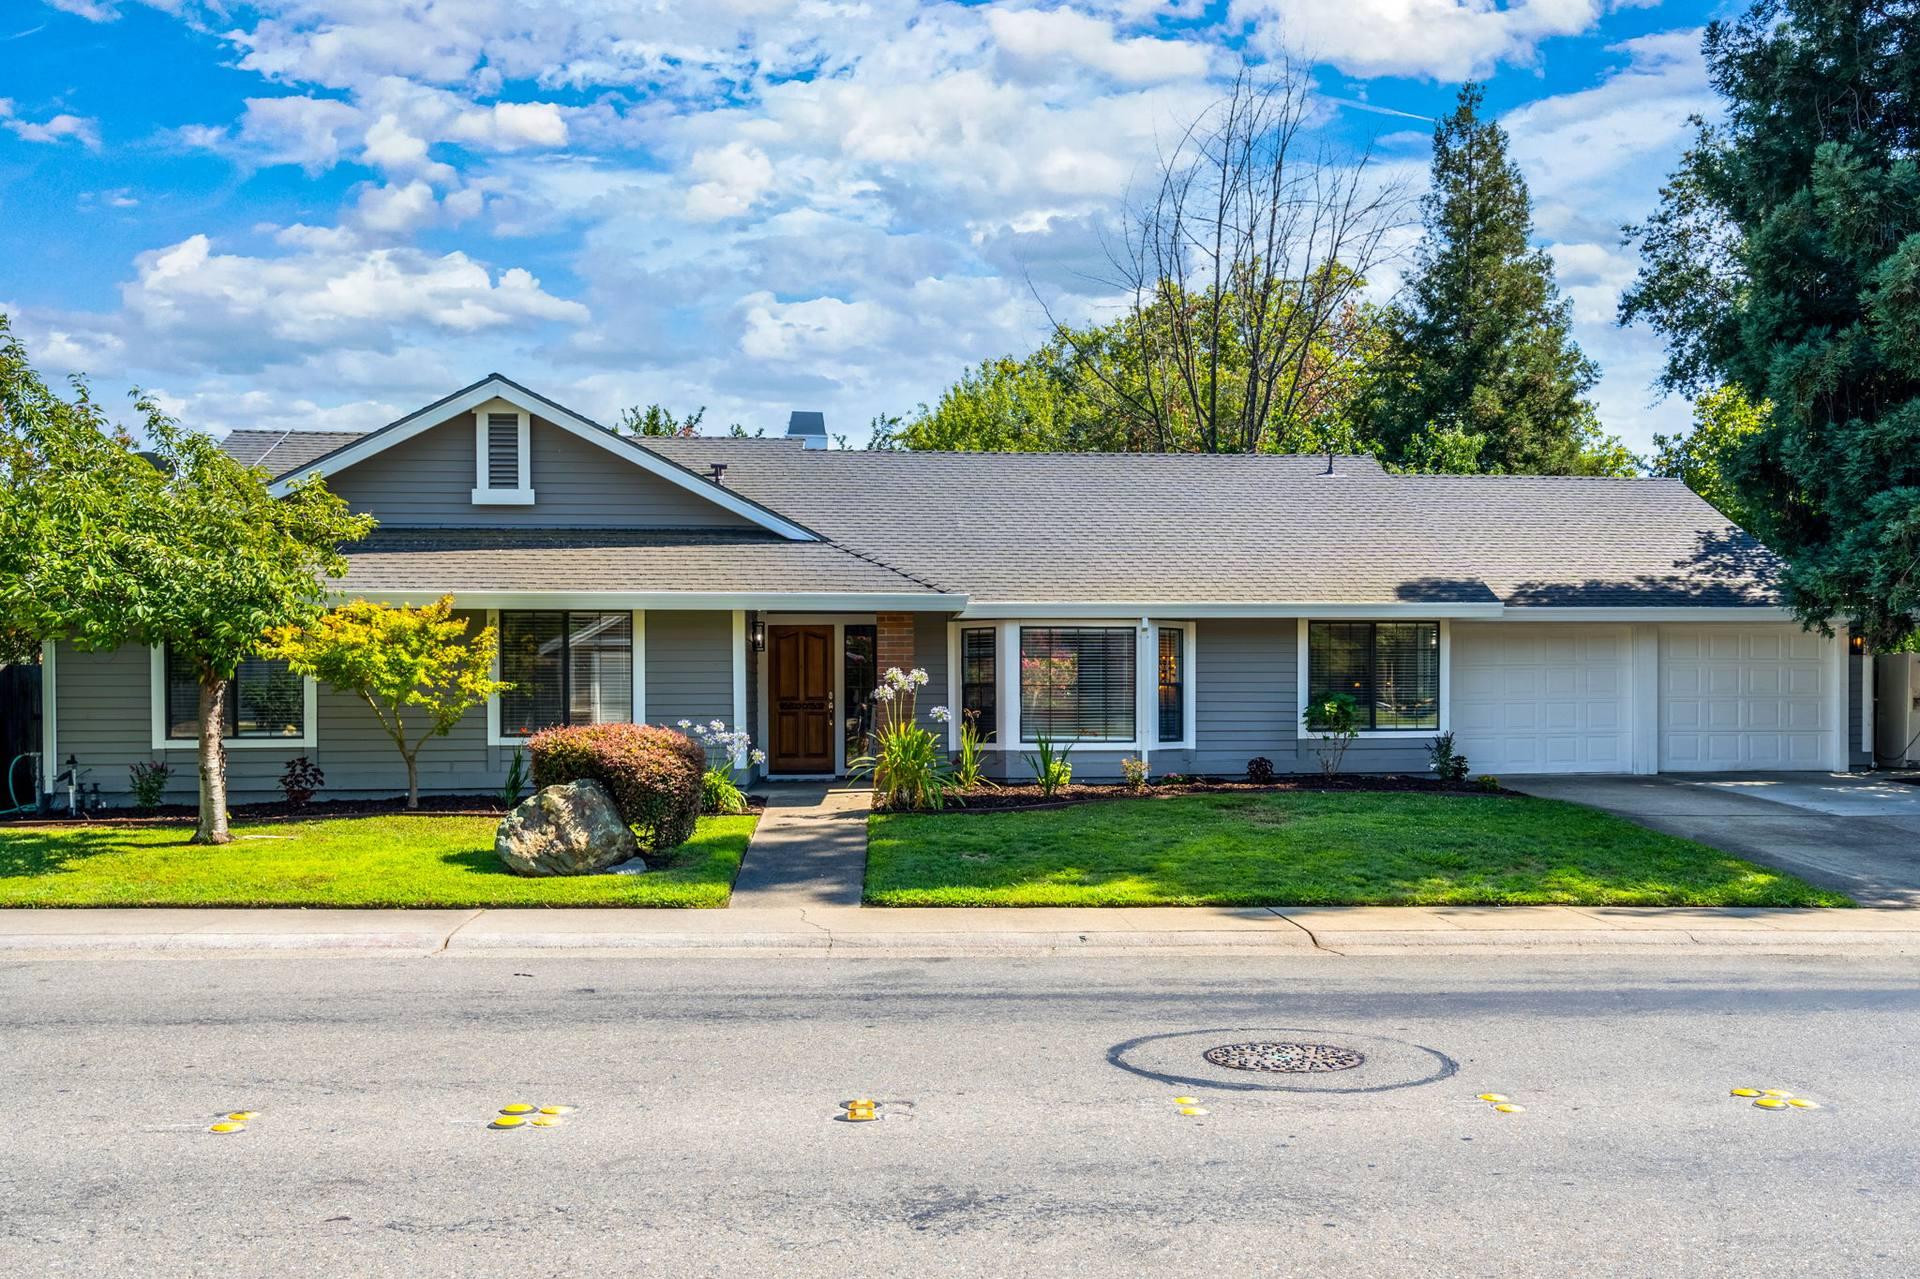 1085 Sandringham Way, Roseville, CA 95661, USA